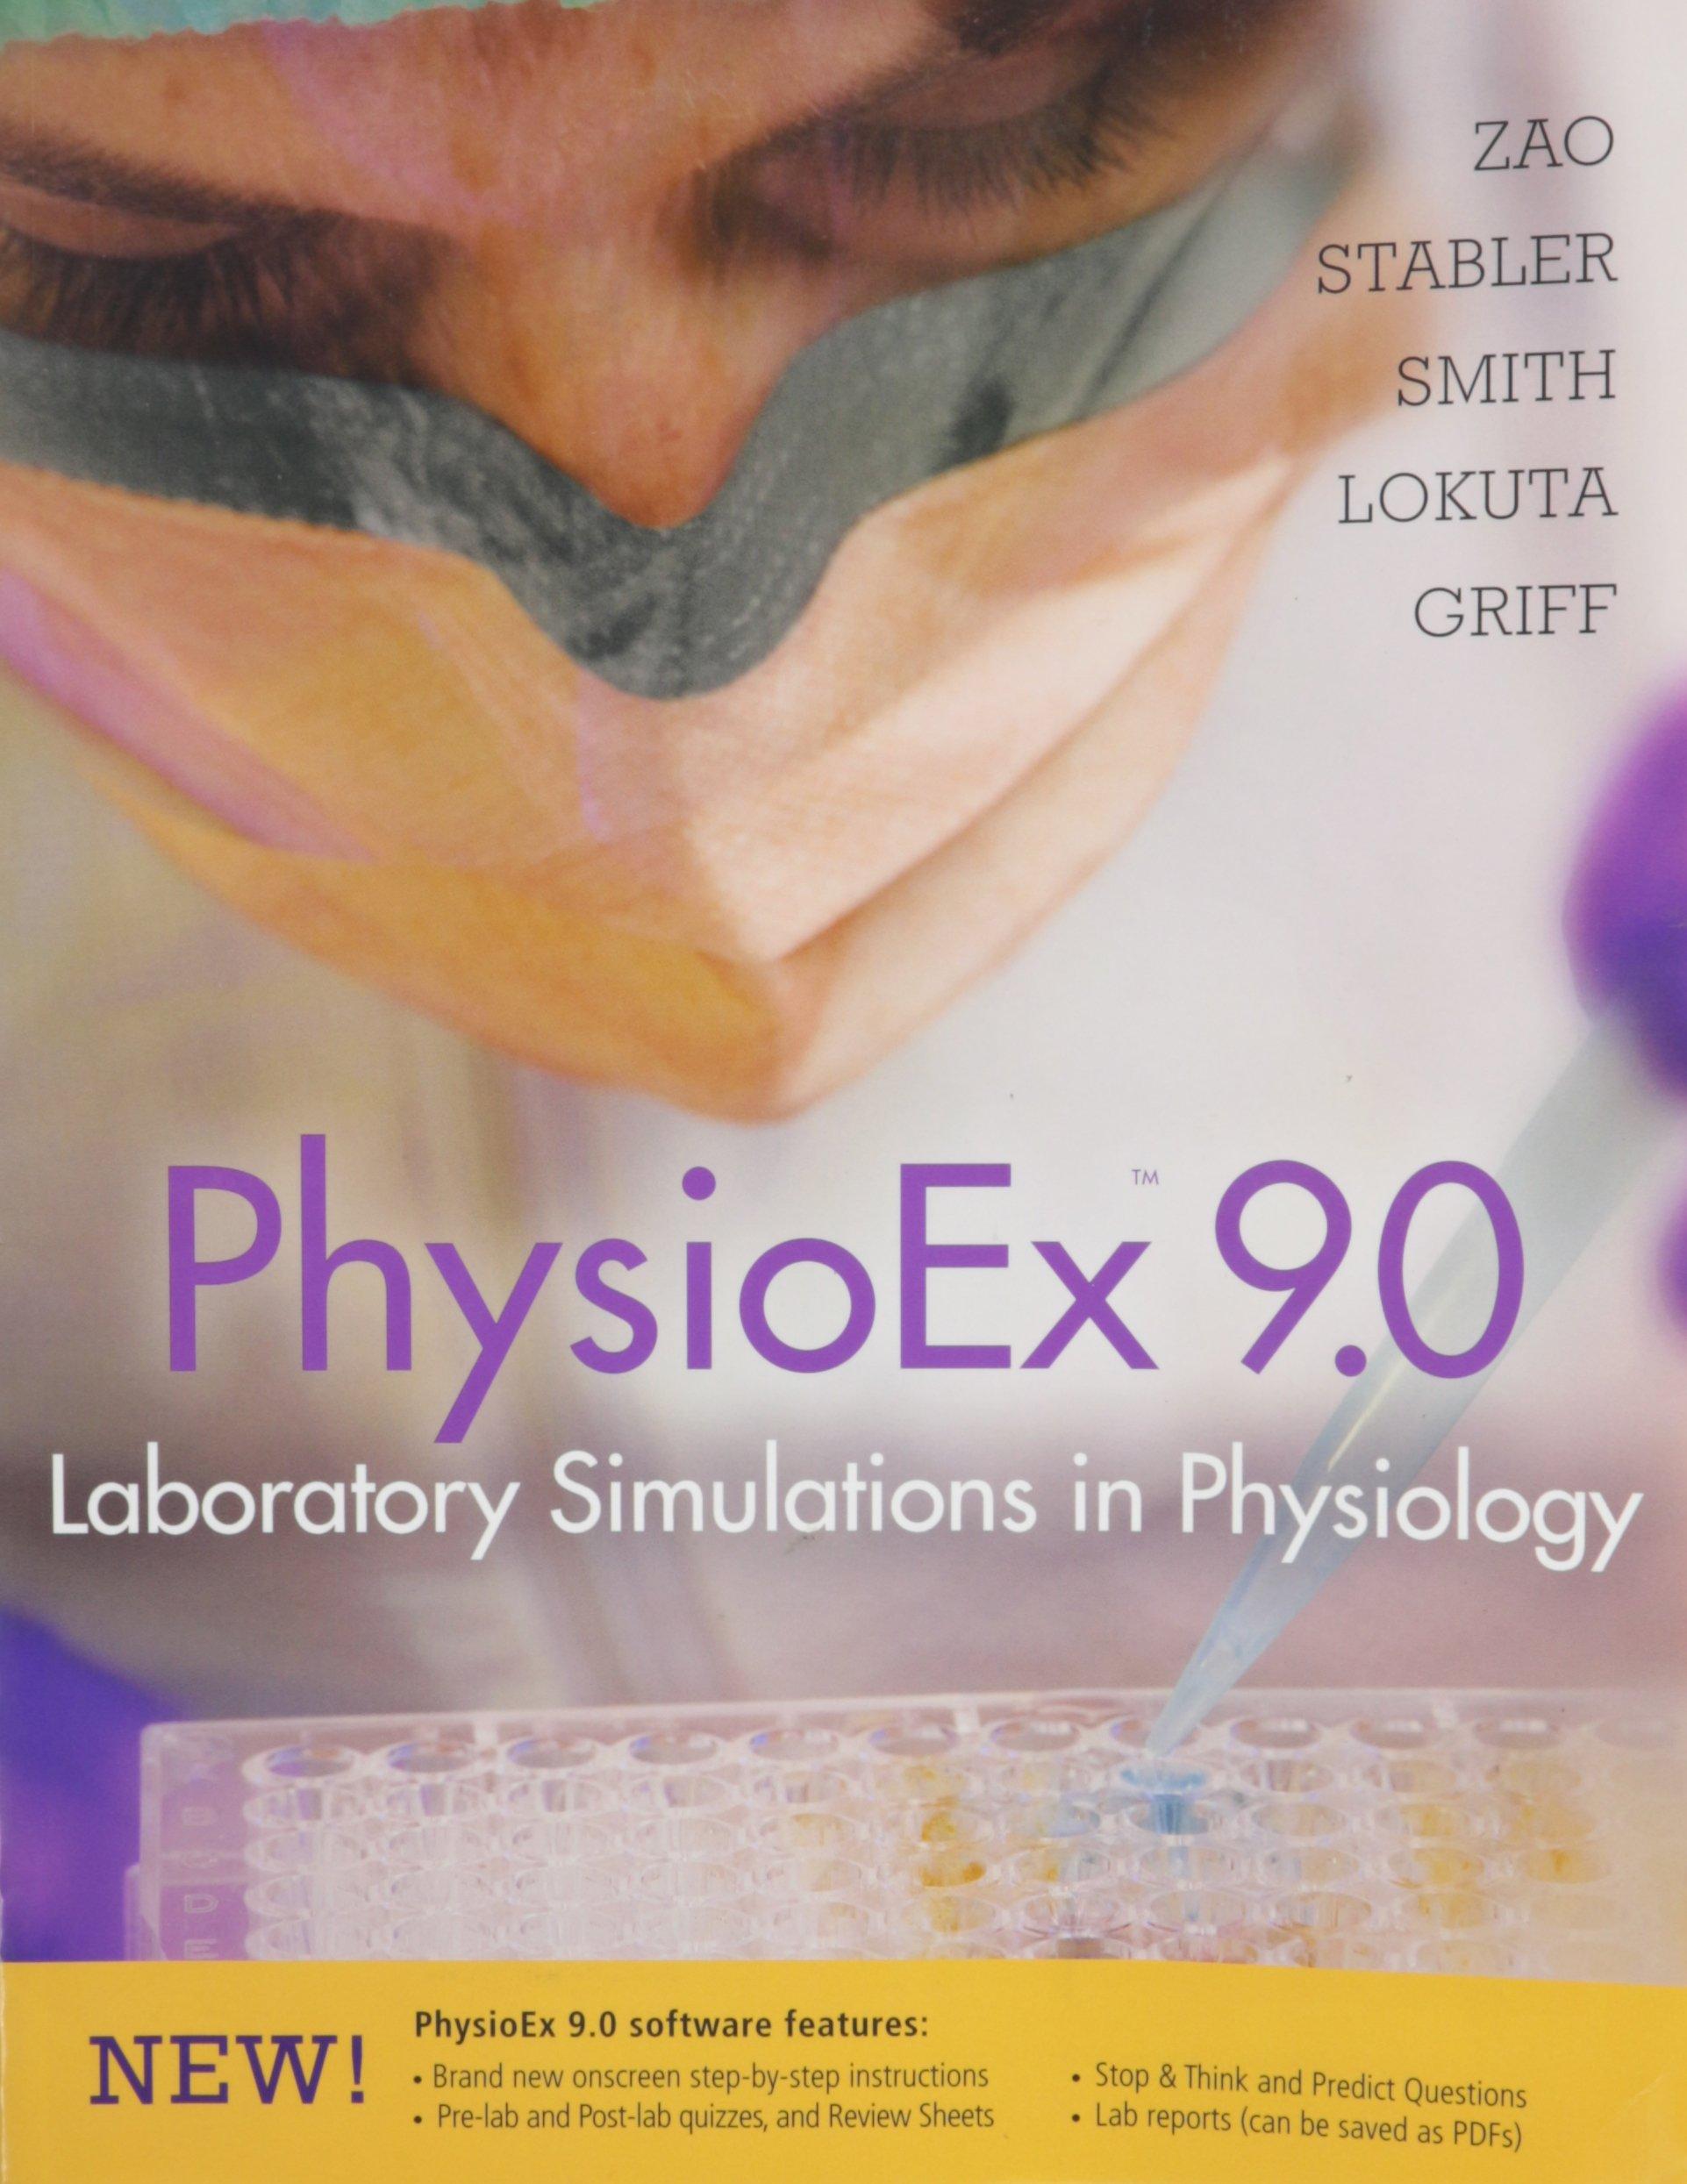 Physioex 9.0 Laboratory Simulations in Physiology W/cd (physioex 9.0 laboratory simulations in physiology w/cd) PDF